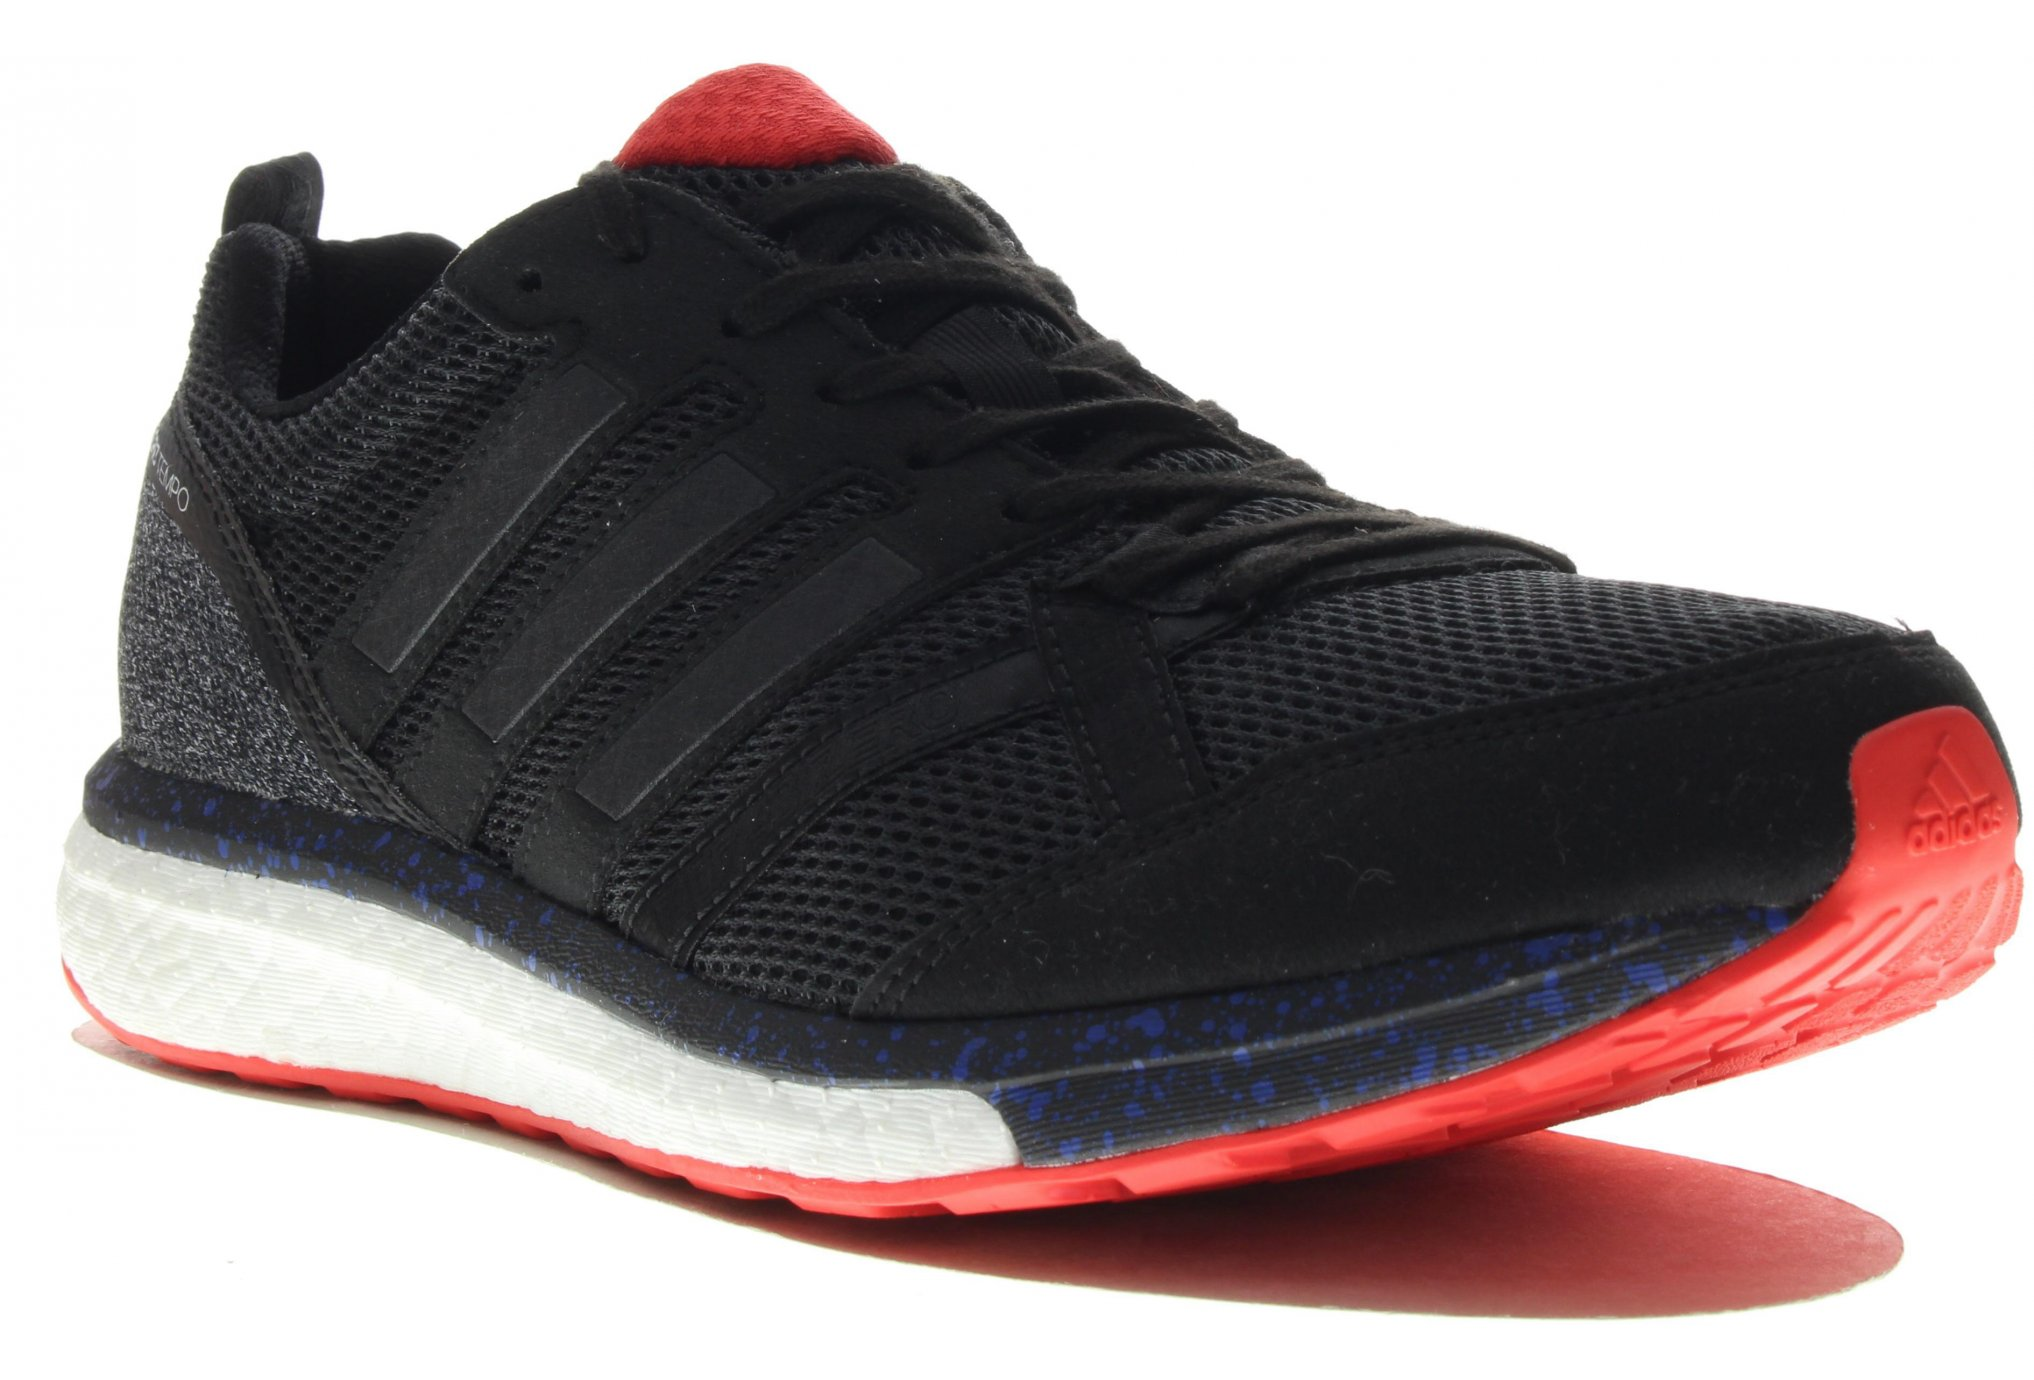 Adidas Adizero tempo 9 aktiv m chaussures homme